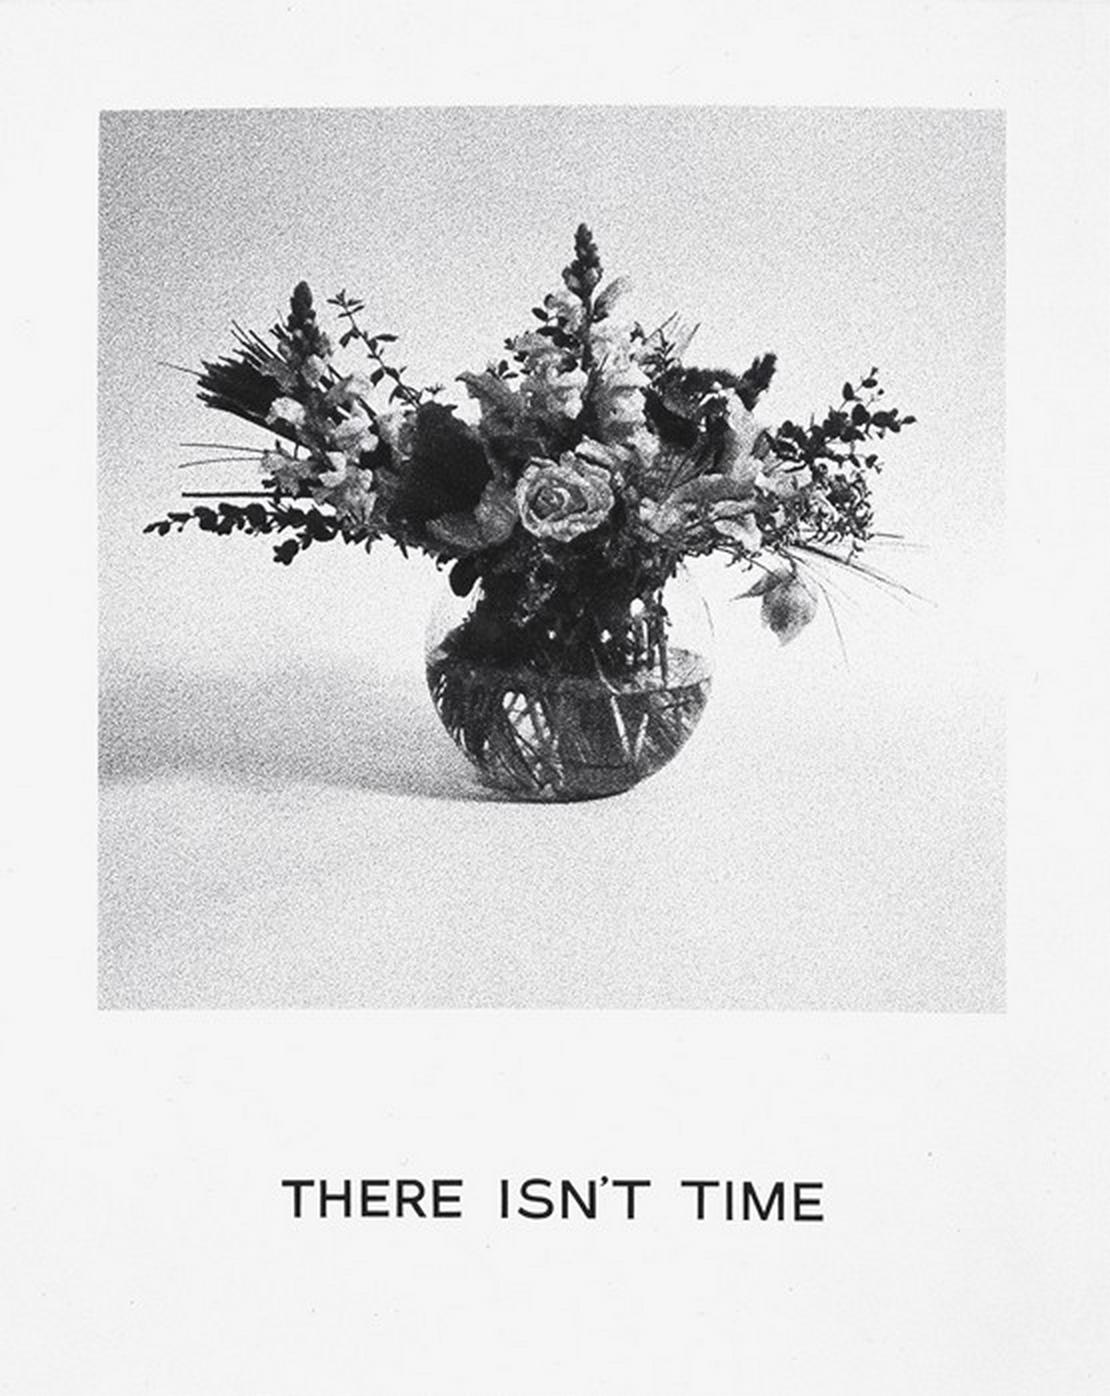 Baldessari-Goya-Series-There-Isn't-Time-Conceptual-Minimalist-Art